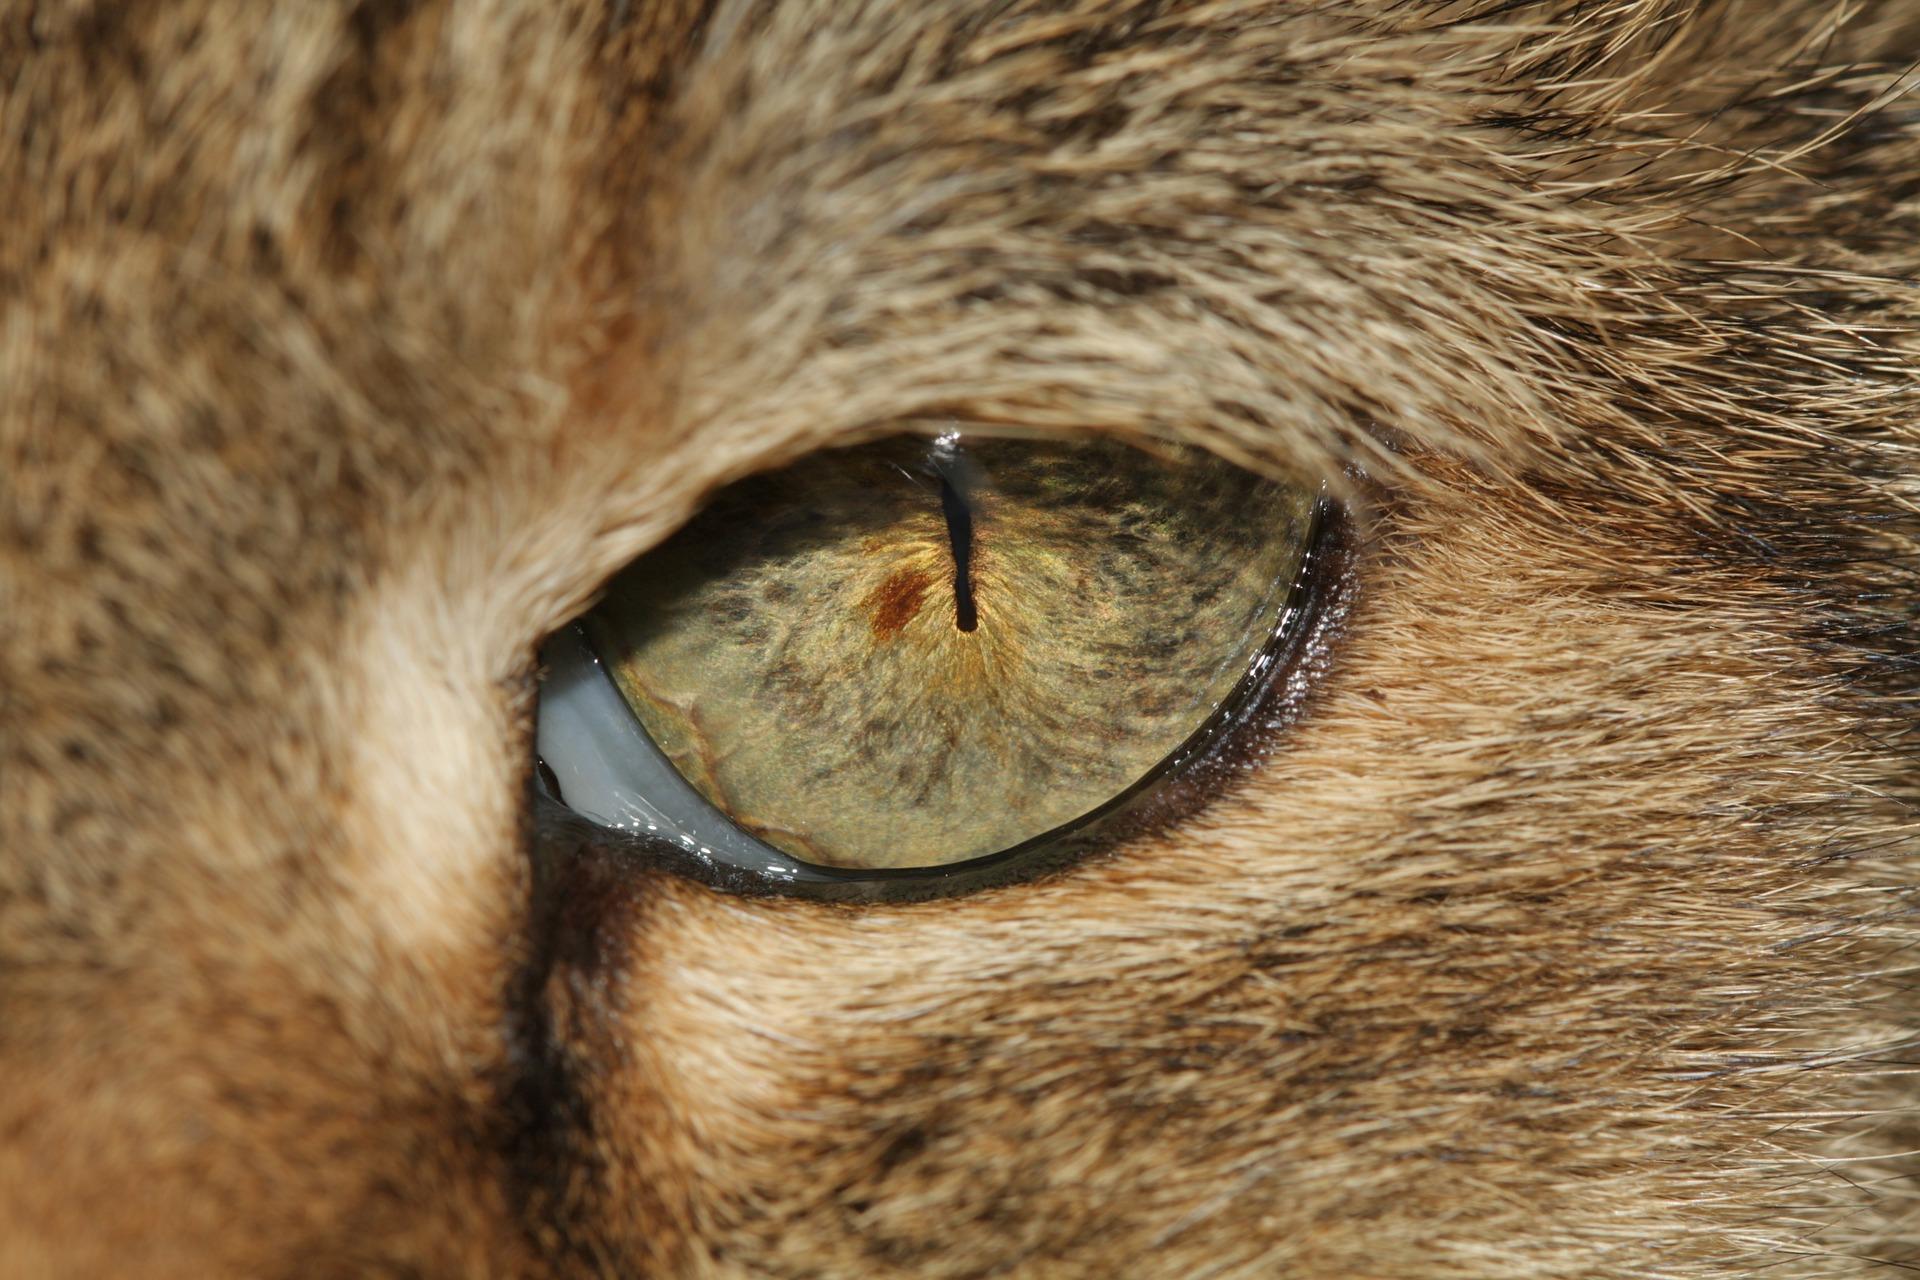 gato-ojo-probelmas_oculares